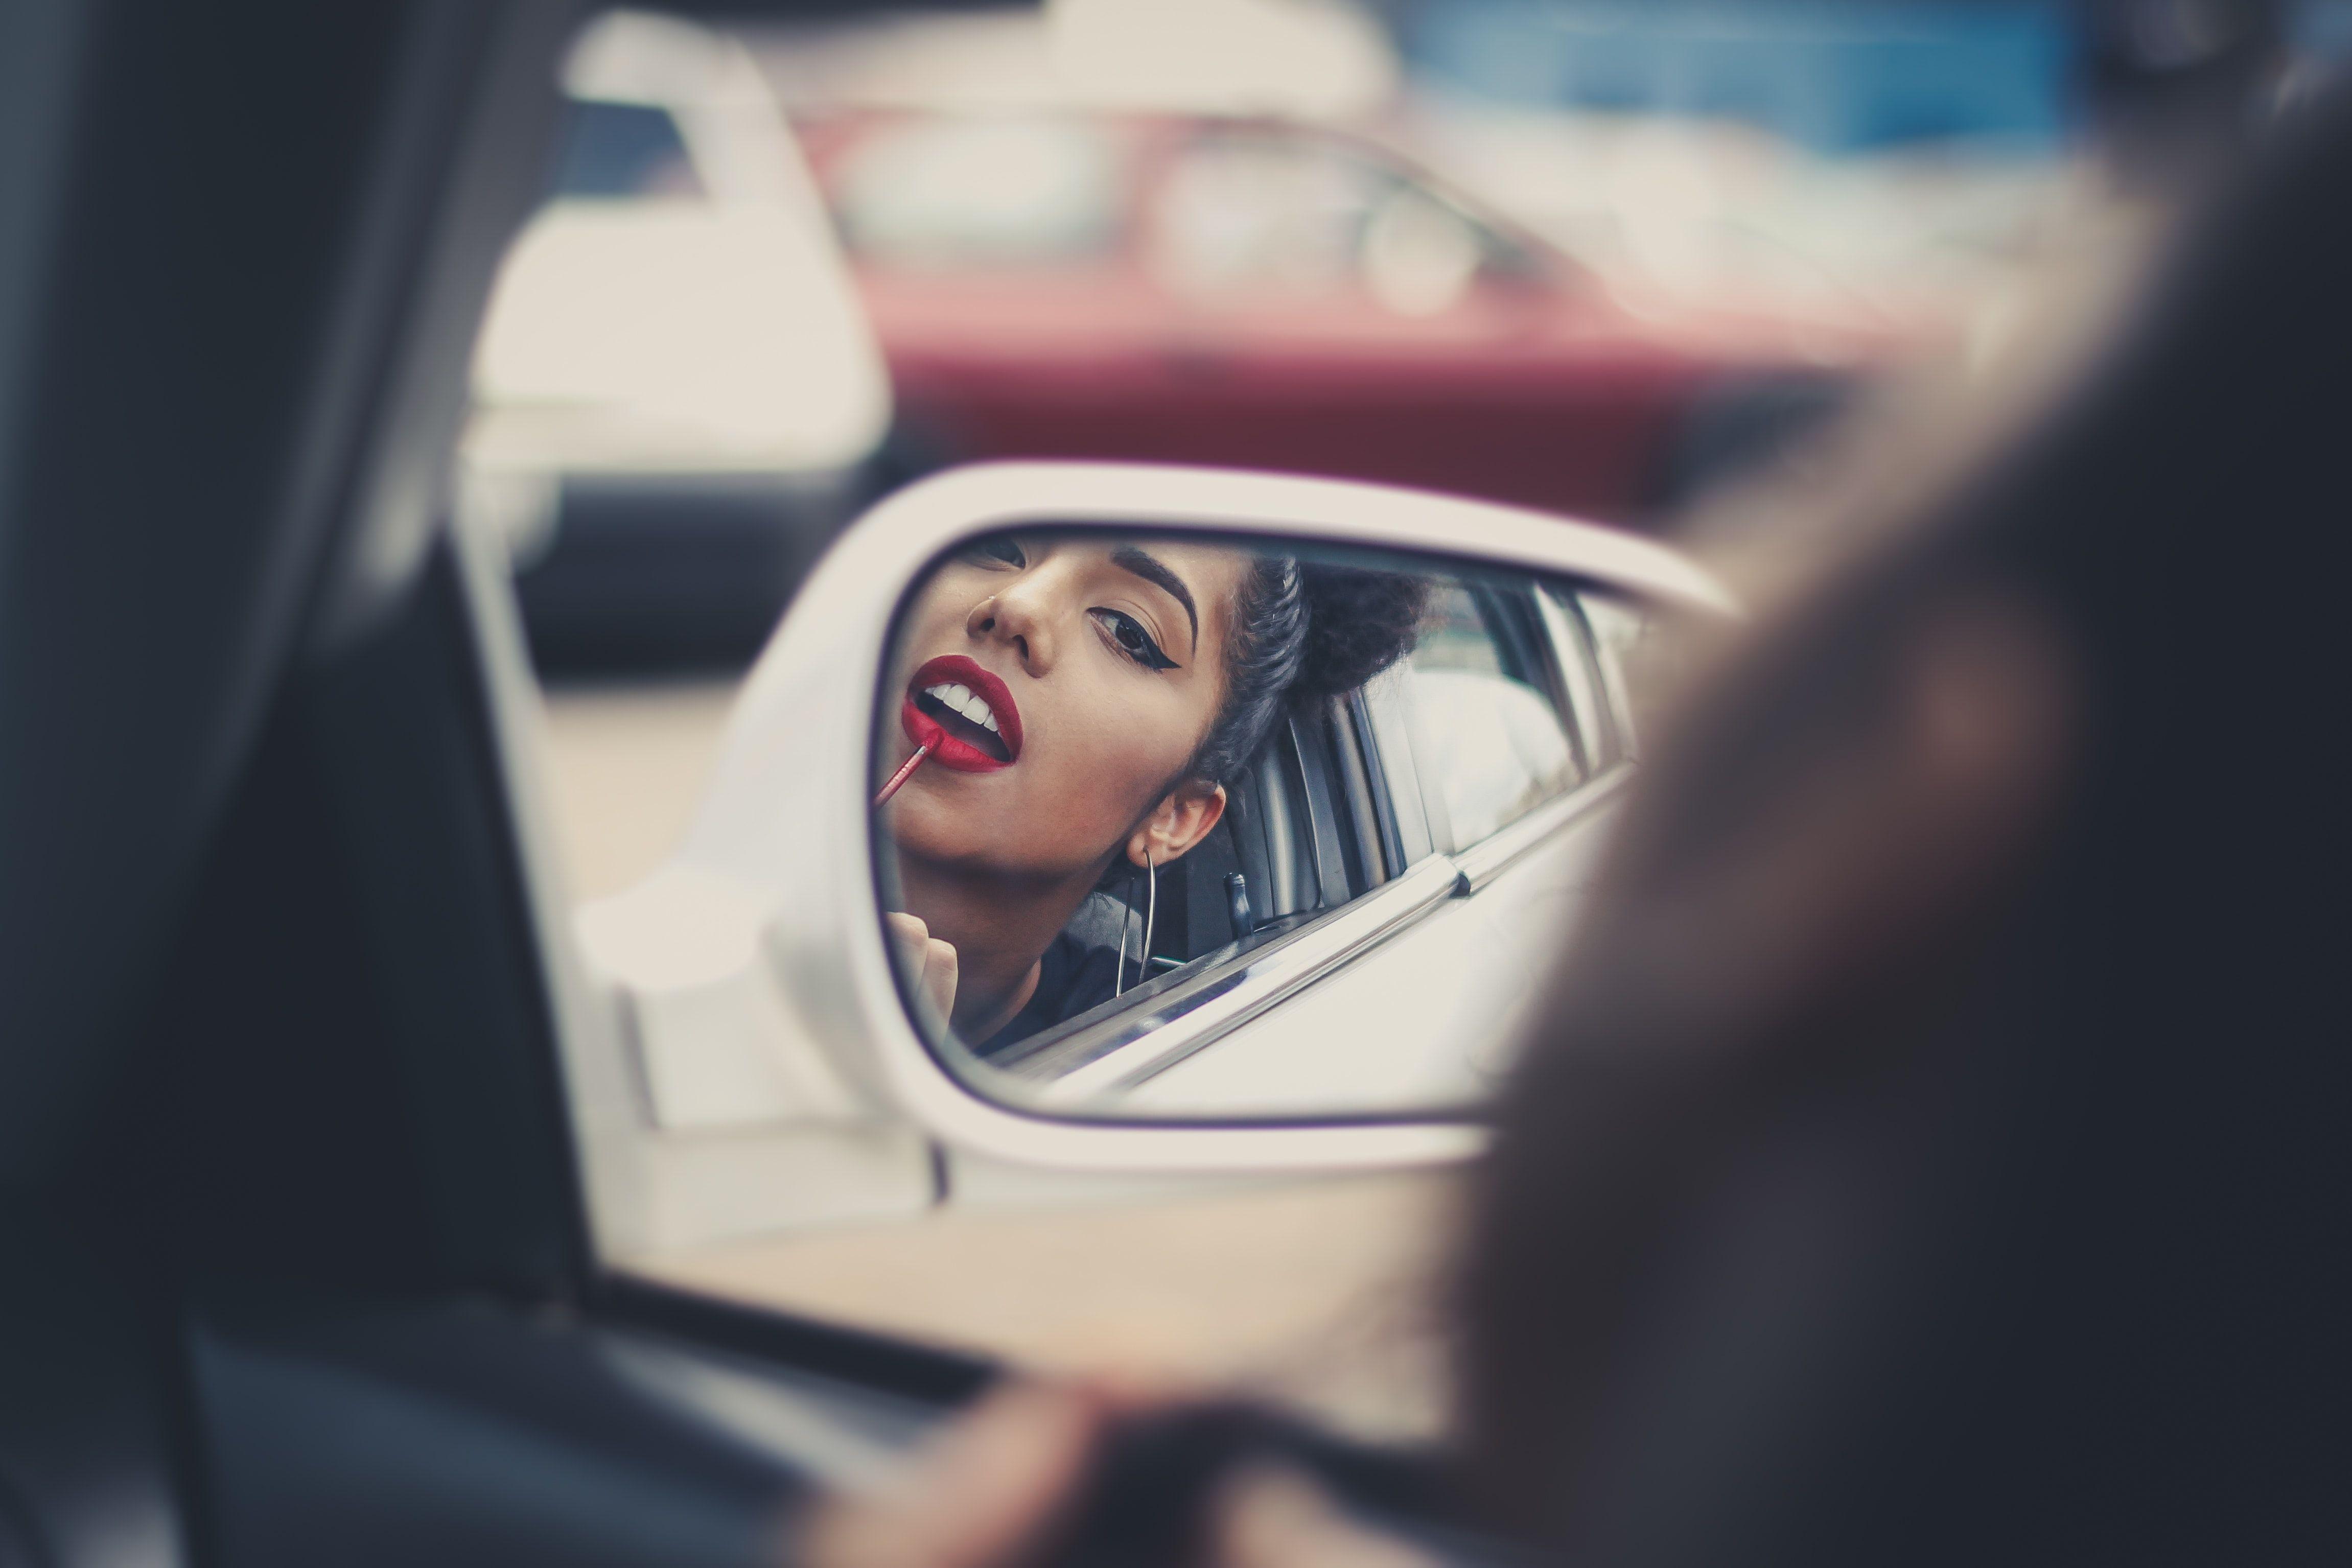 Friendly reminders: wear that lipstick, buy that plane ticket, and #ShopROMAN for your travel outfits 💄✈️🛍️ #WhereYourStoryBegins . . . . . . pc: Gustavo Spindula (@gspindula) via @upslpash . . . #fashion #lifestyle #travel #inspo #explorepage #lifestylepage #inspiration #wanderlust #citystyle #fashion #love #travelinspo #fashionweek #mondaymotivation #happyhumpday